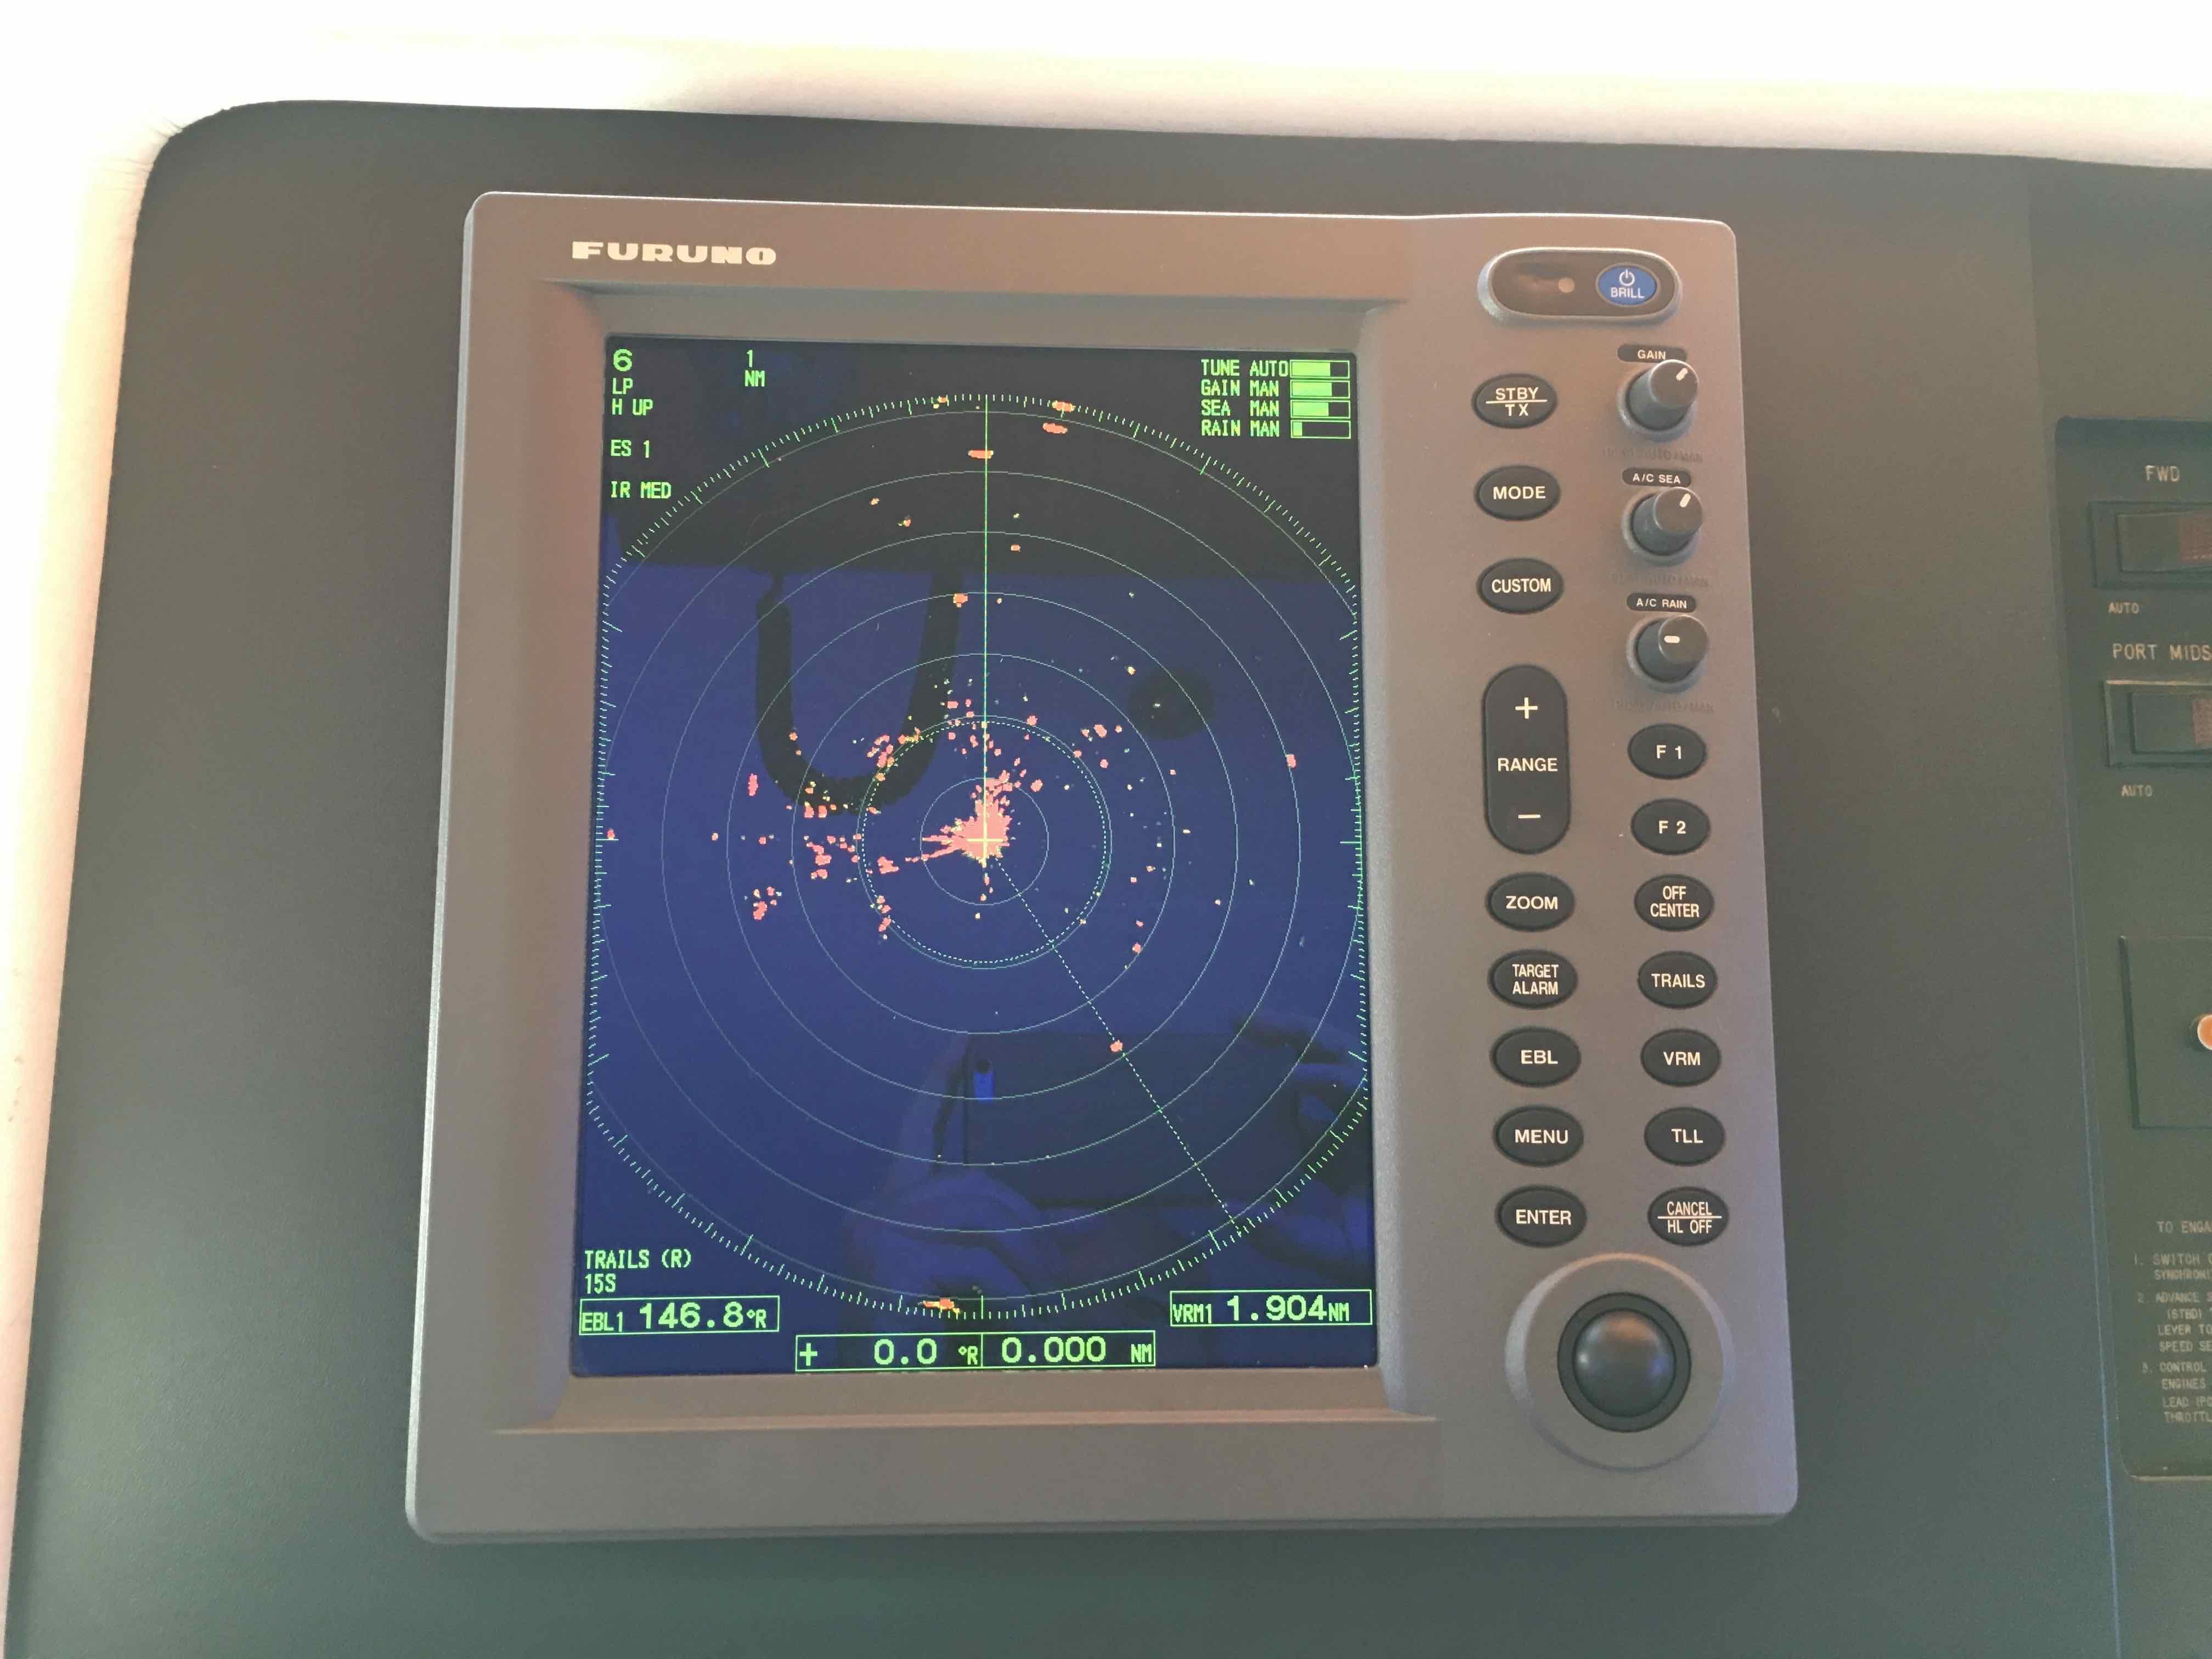 Hatteras 74 CPMY Furuno Radar